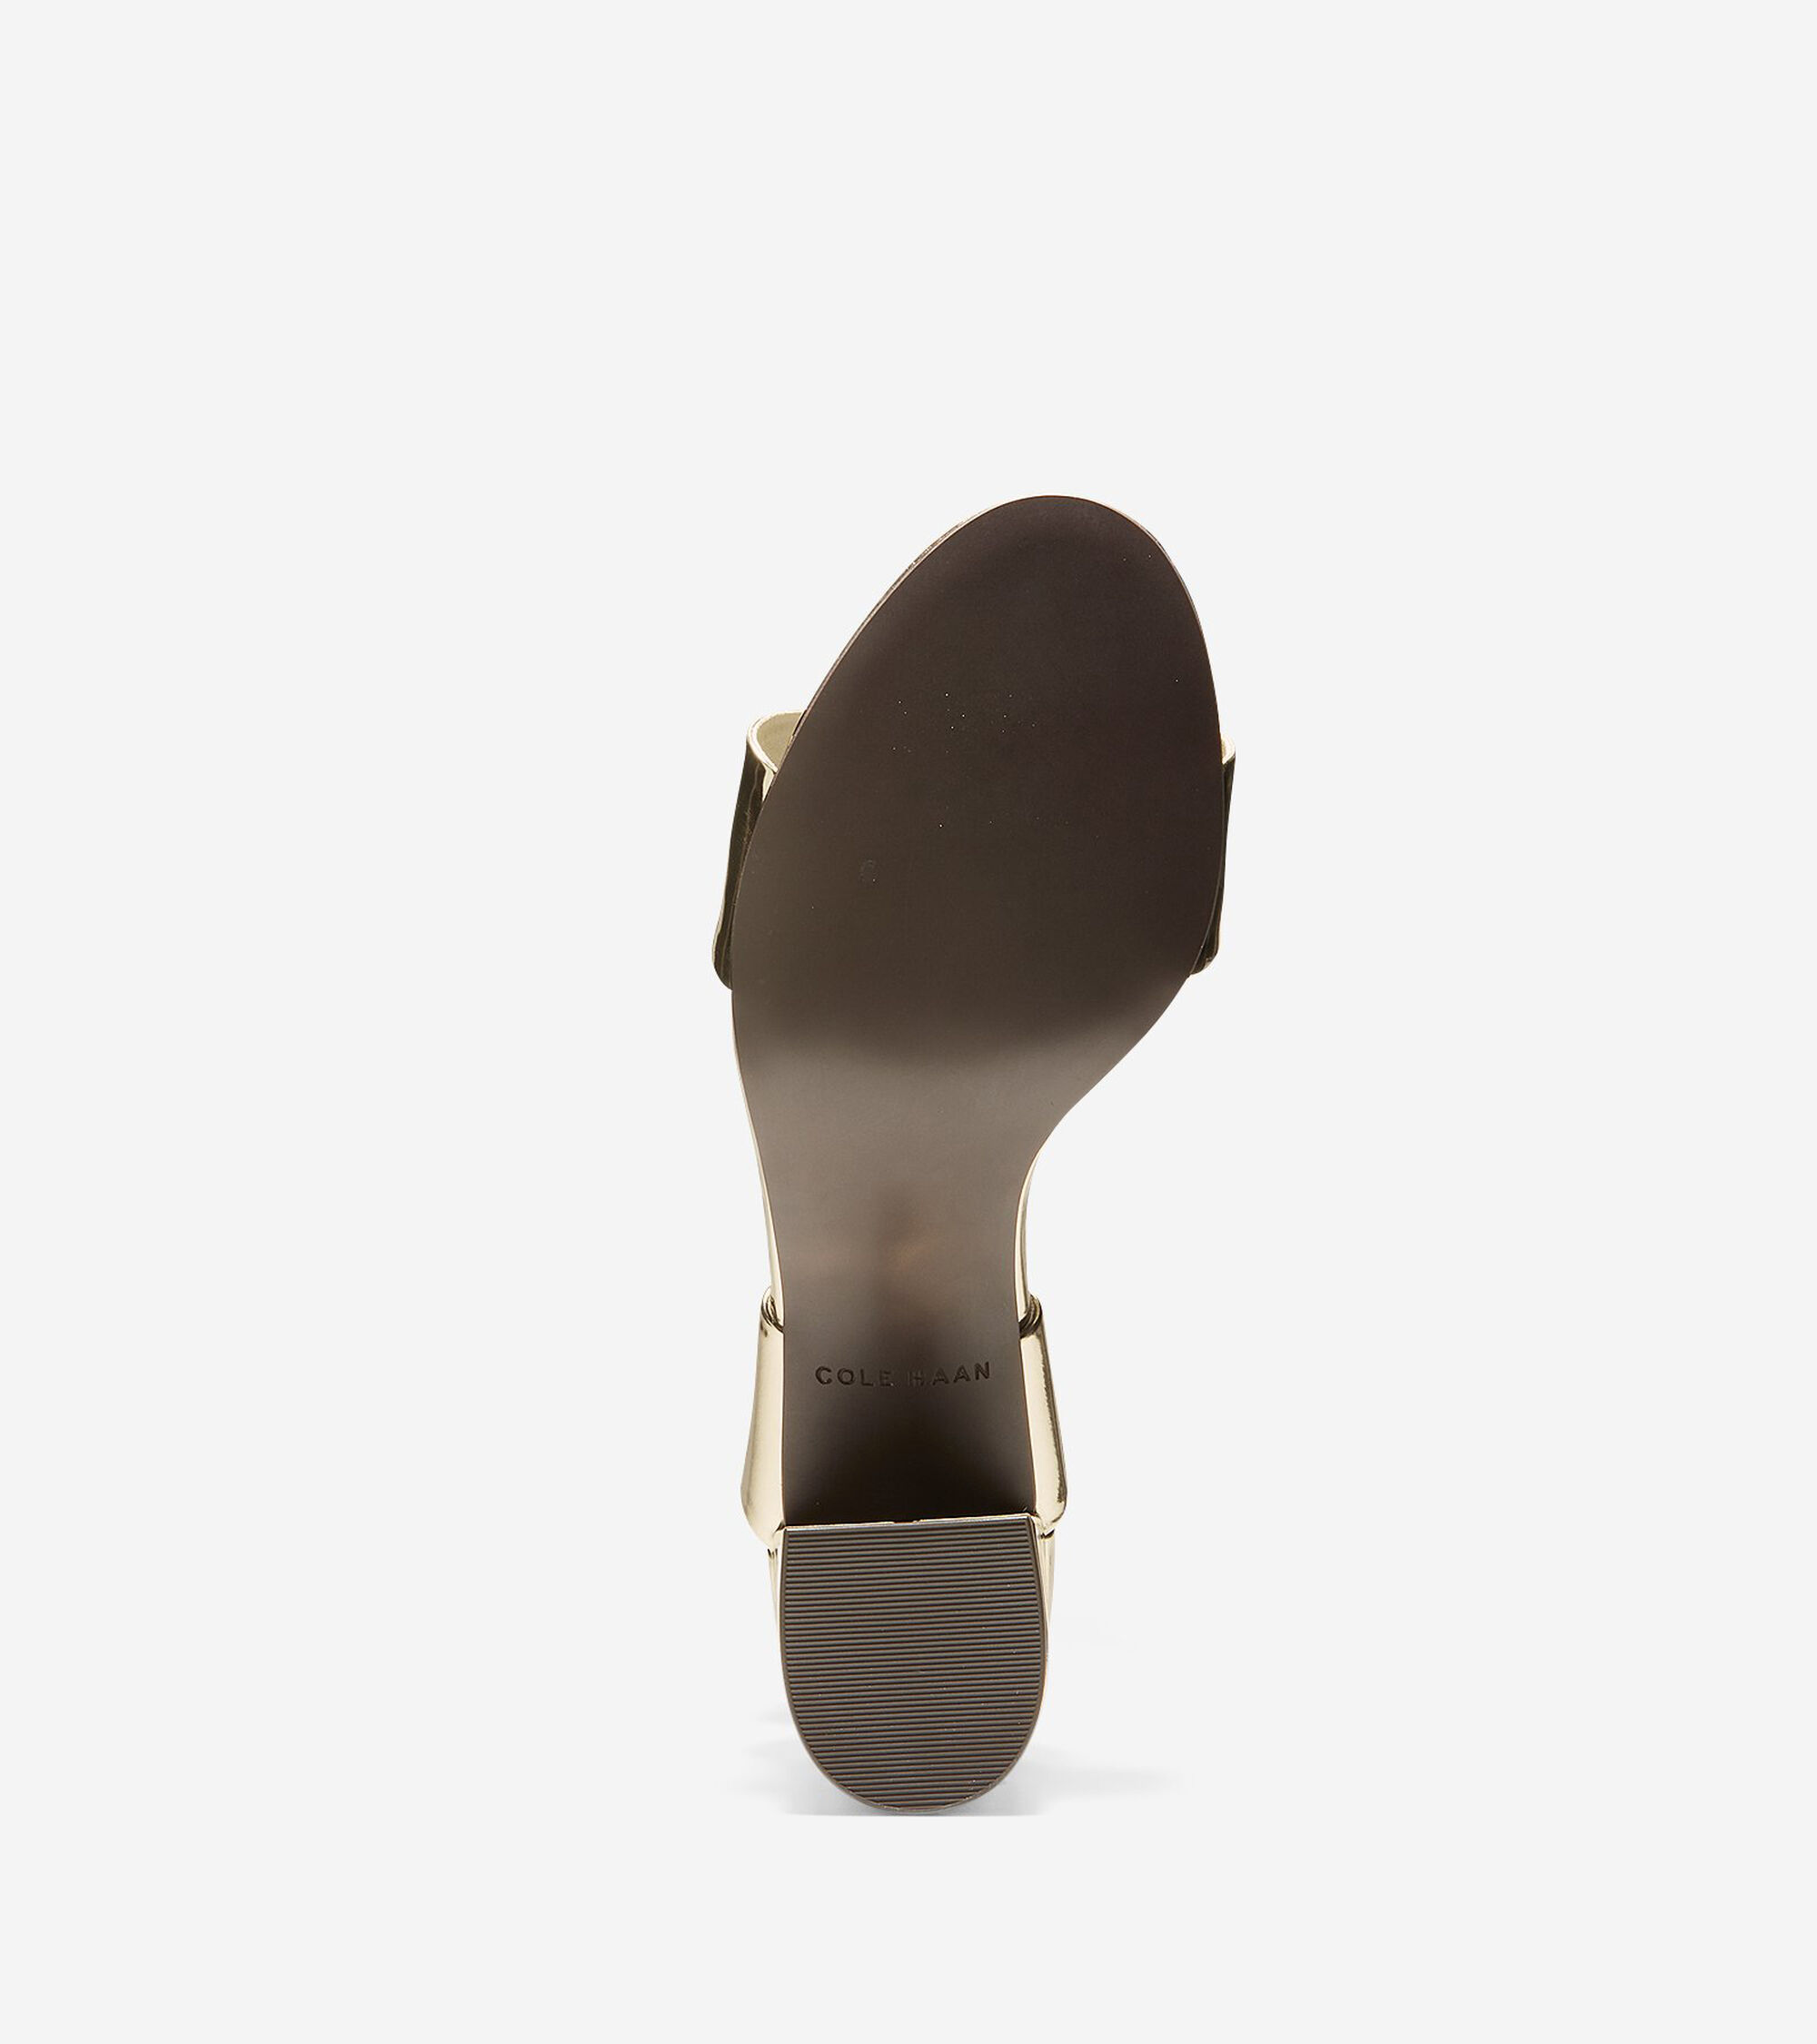 390c1b22c10 Women s Avani City Sandals 65mm in Gold